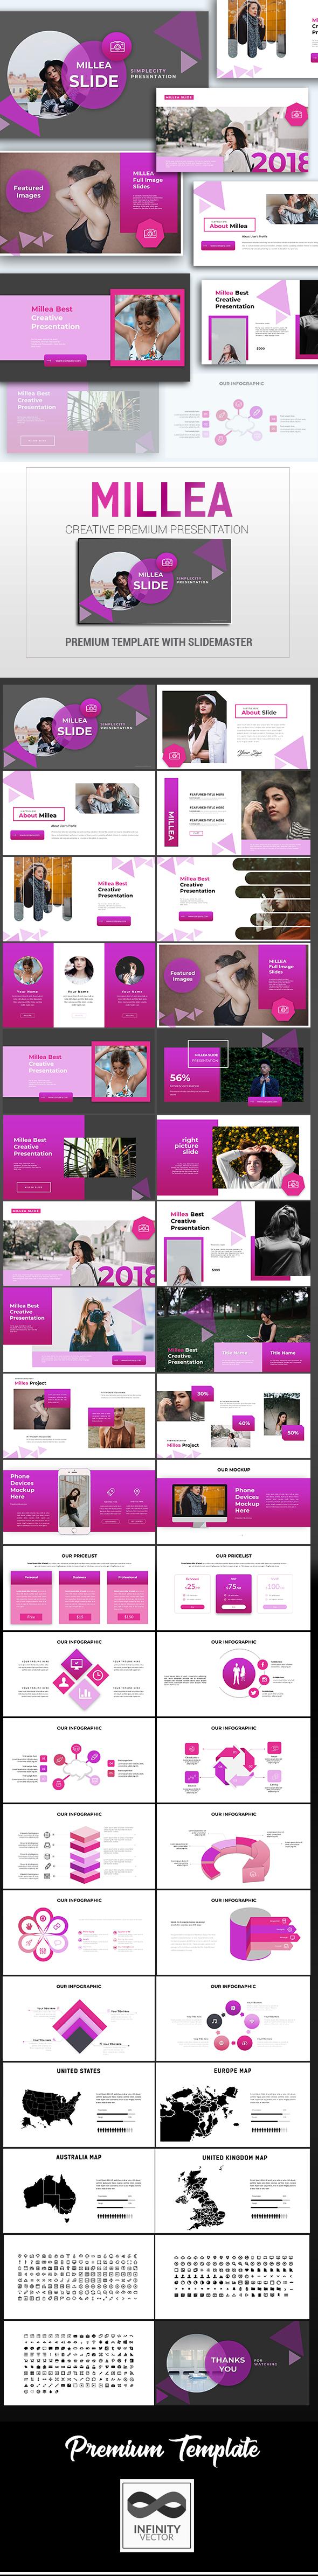 Millea Creative Presentation - PowerPoint Templates Presentation Templates